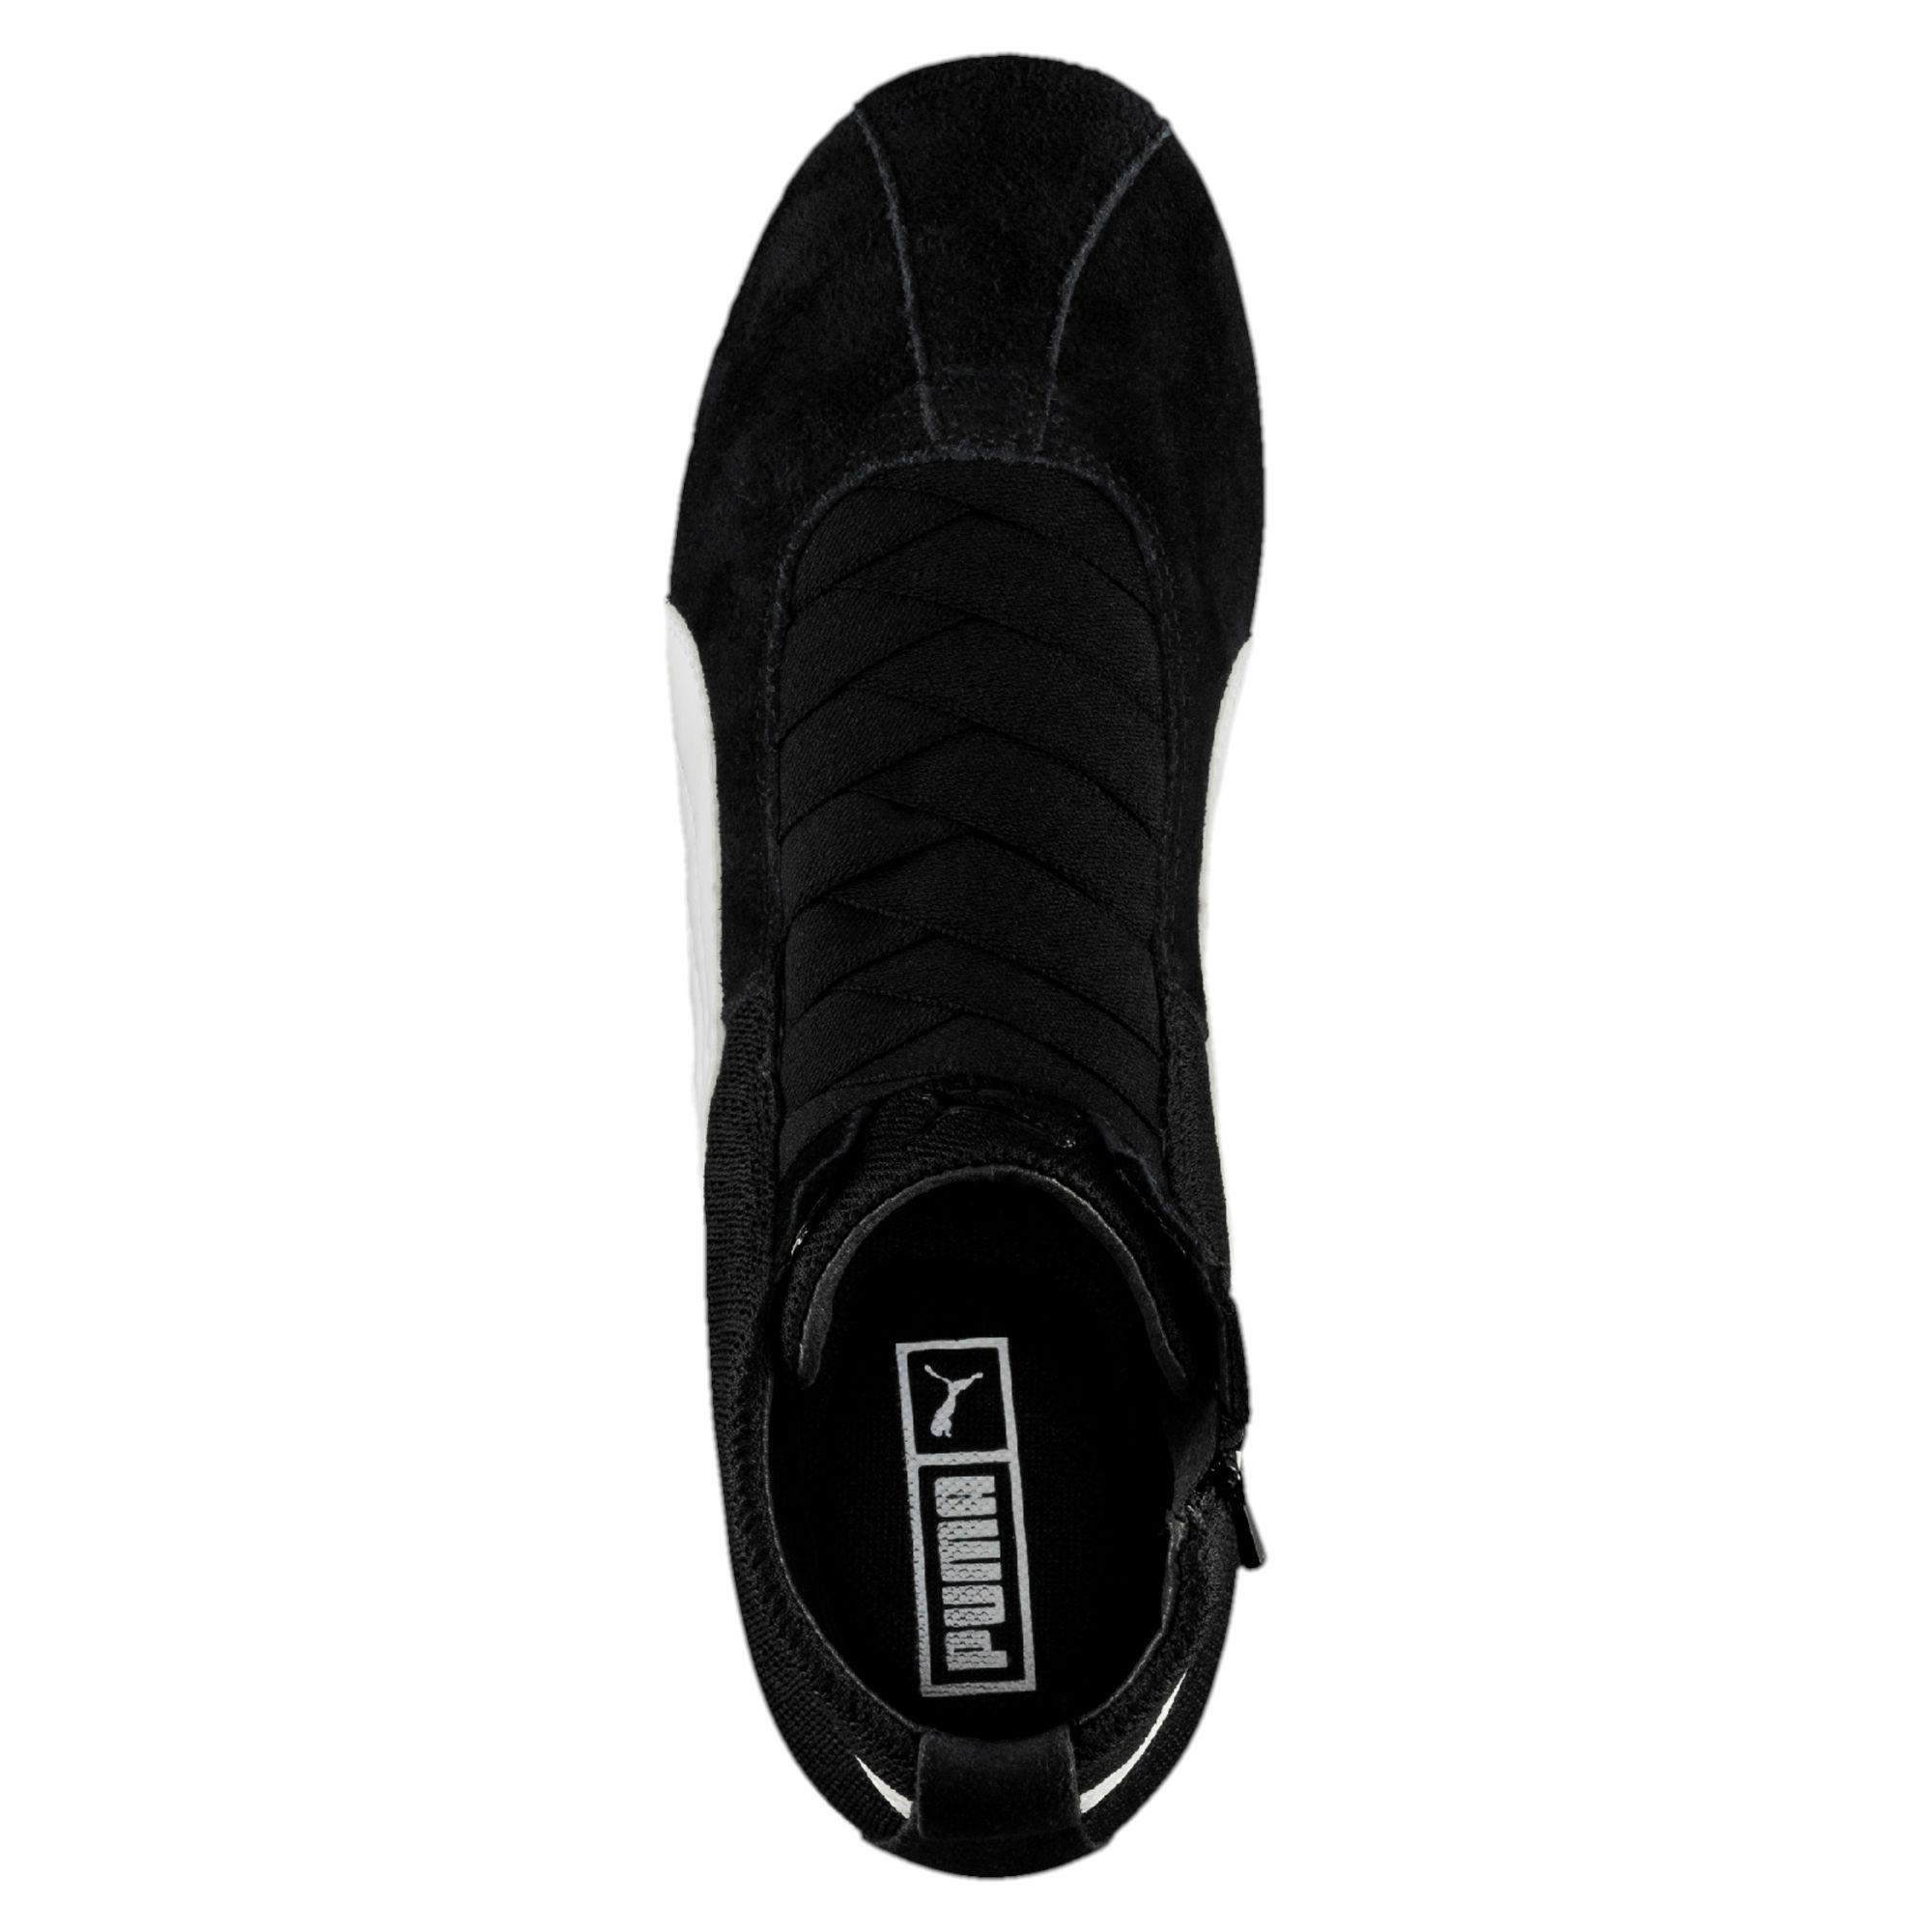 PUMA-Chaussure-montante-Eskiva-Mid-Textured-pour-femme-Bottines-Femmes-Neuf